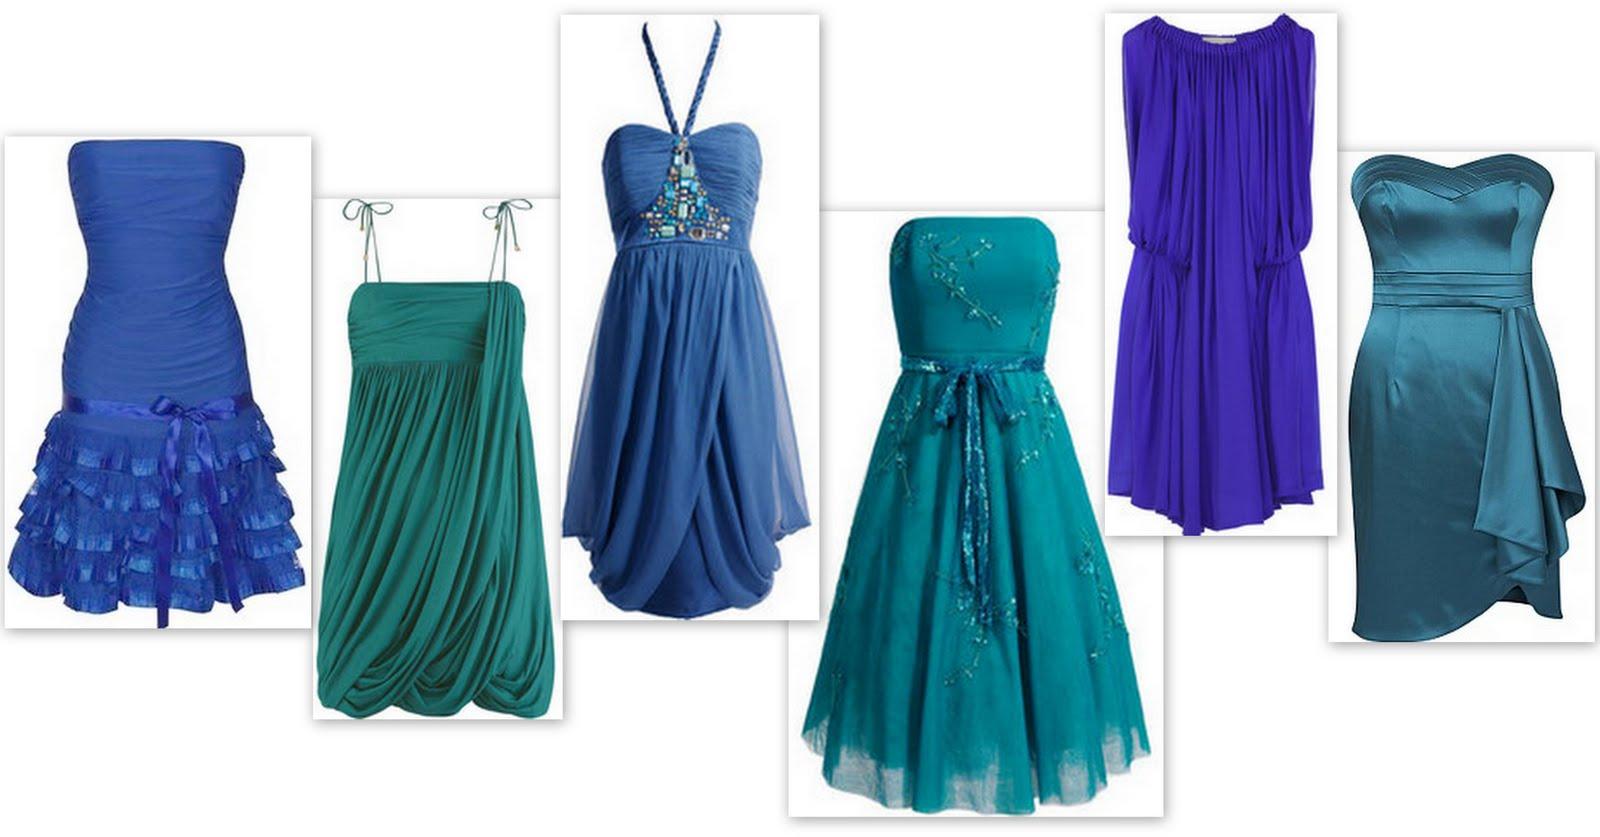 Peacock blue bridesmaid dress.